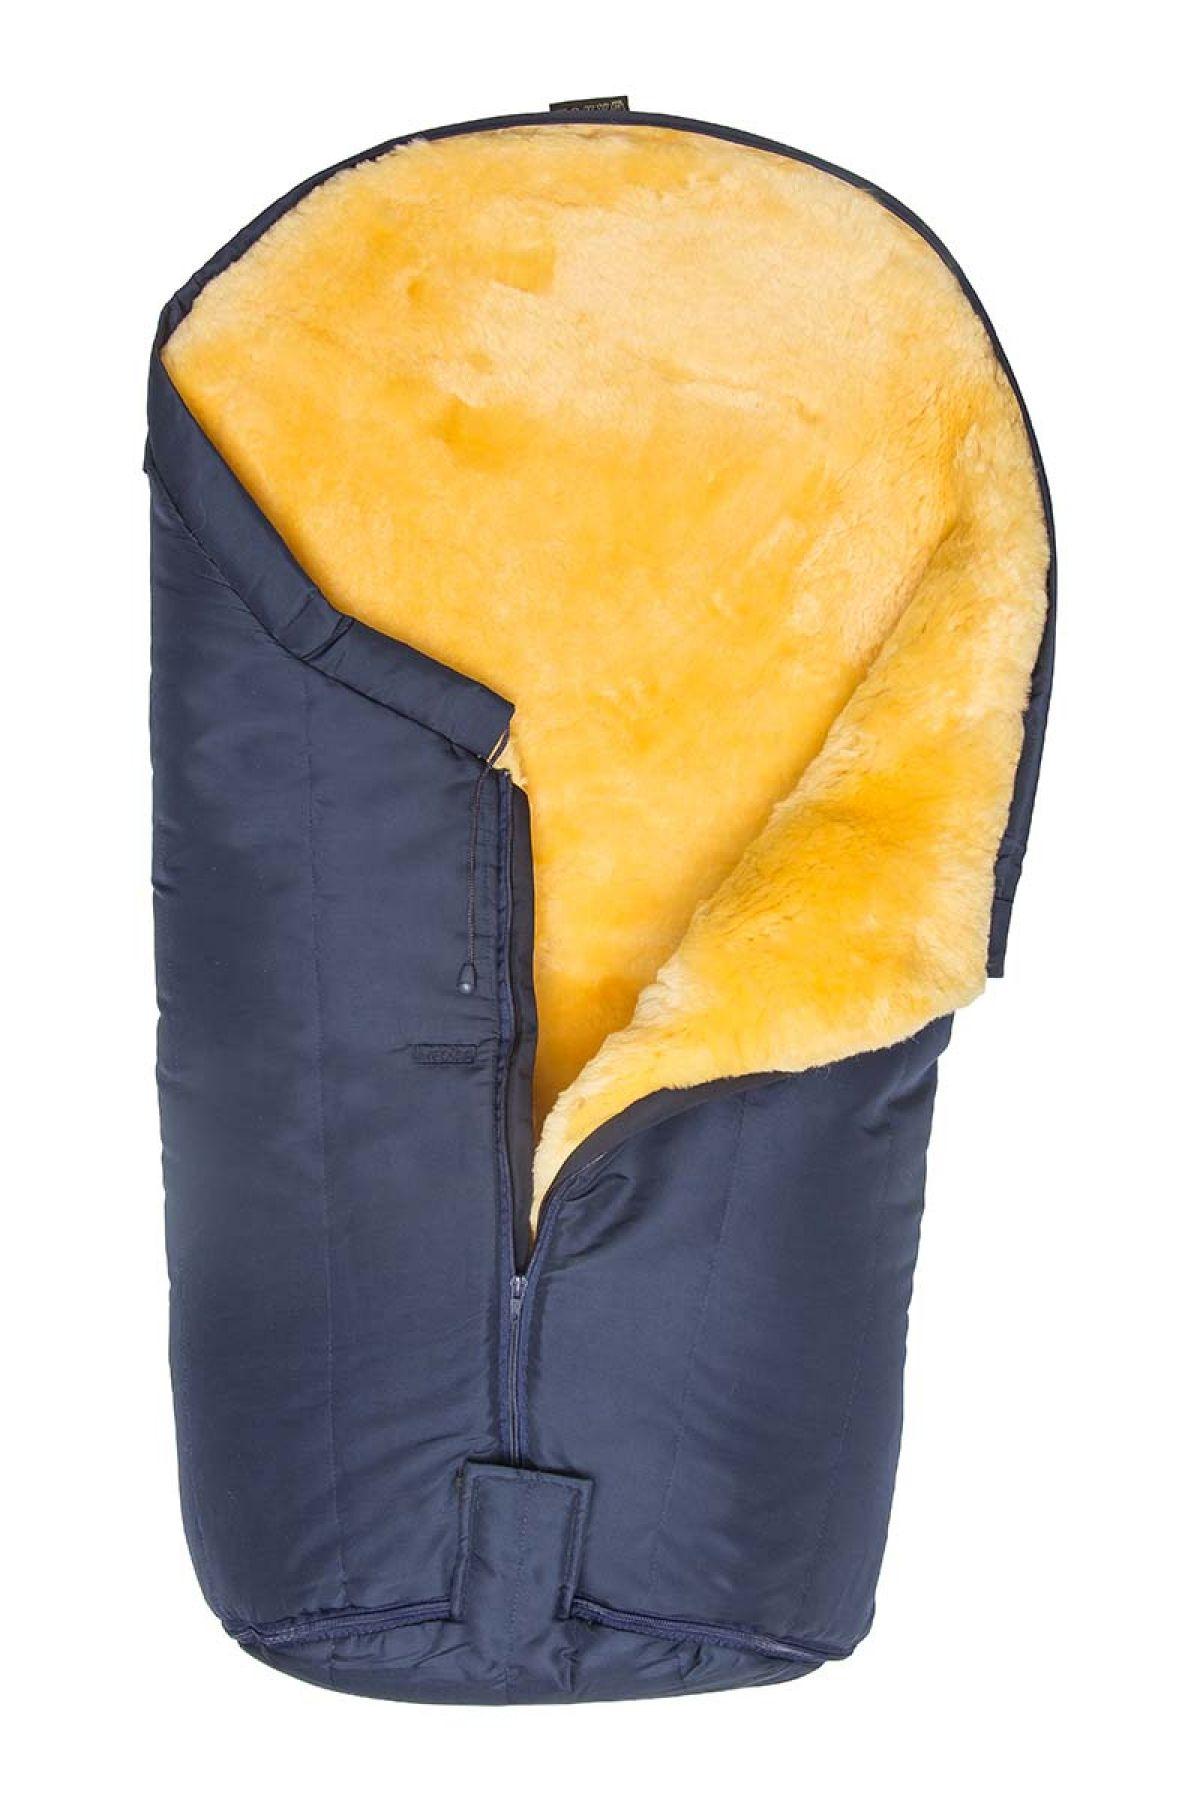 Sheepy Care Zippered Baby Sleeping Bag Navy blue